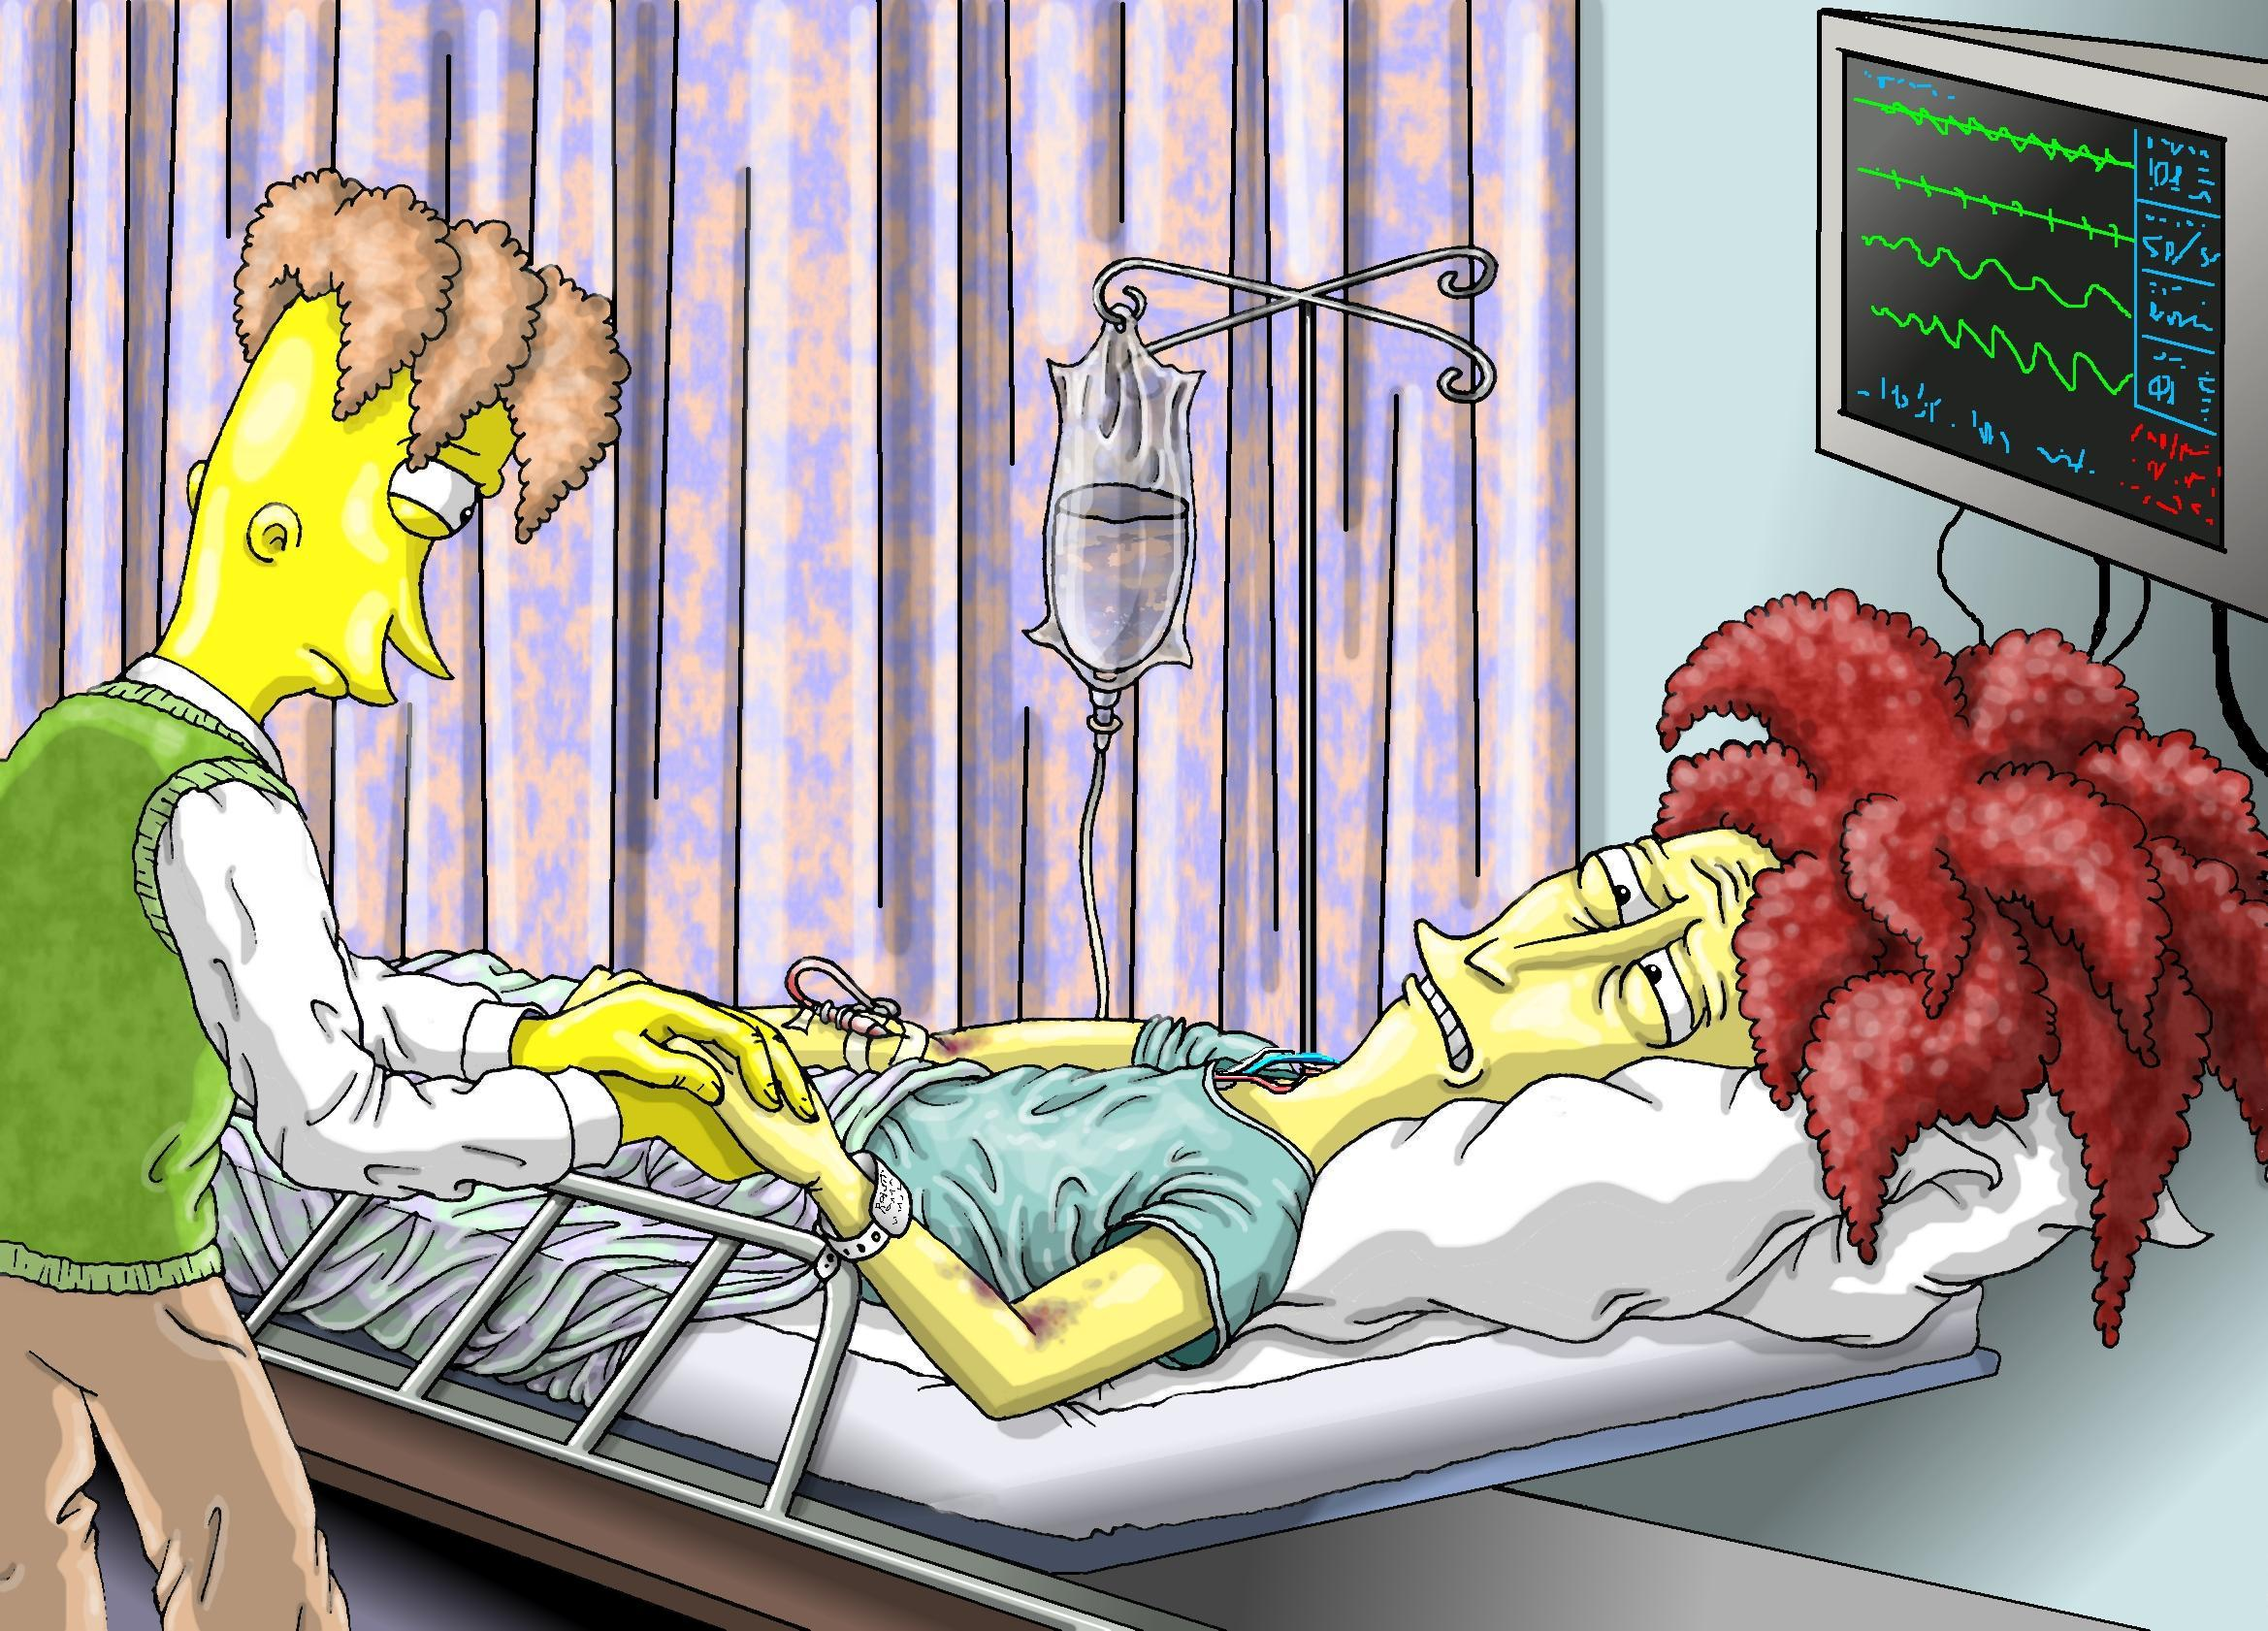 Sickbed Bob by Nevuela